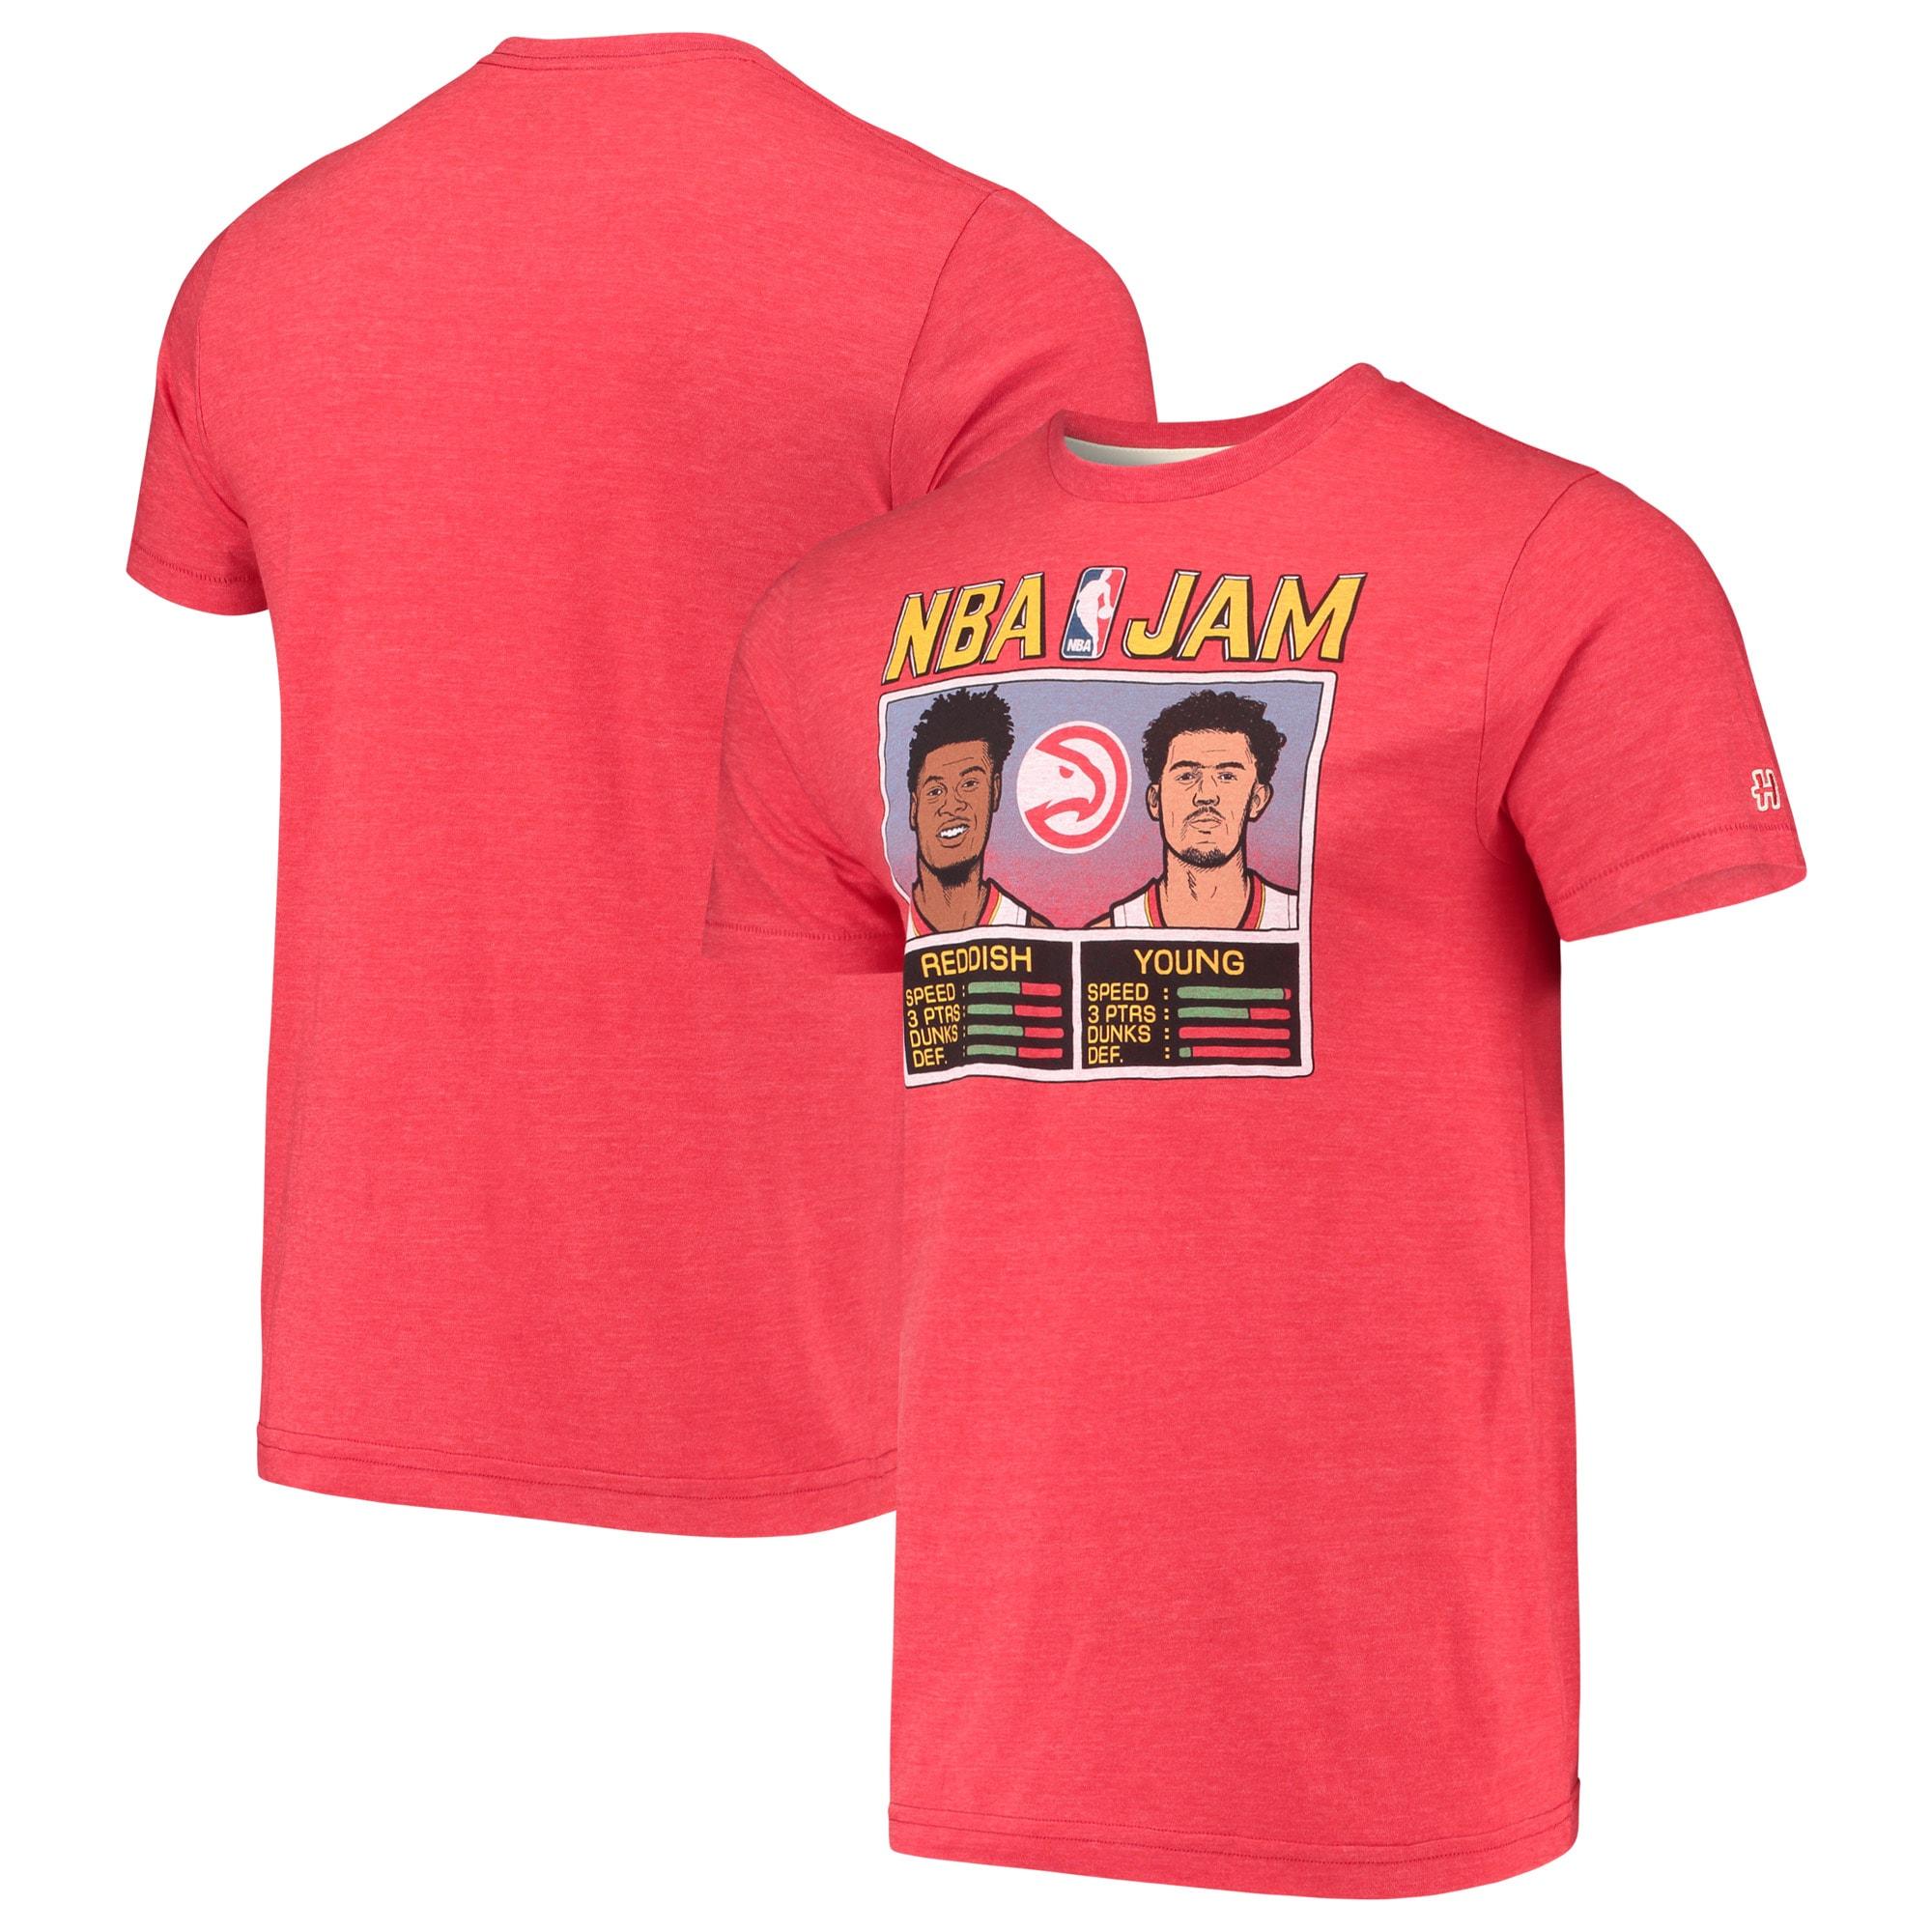 Cam Reddish & Trae Young Atlanta Hawks NBA Jam T-Shirt - Red